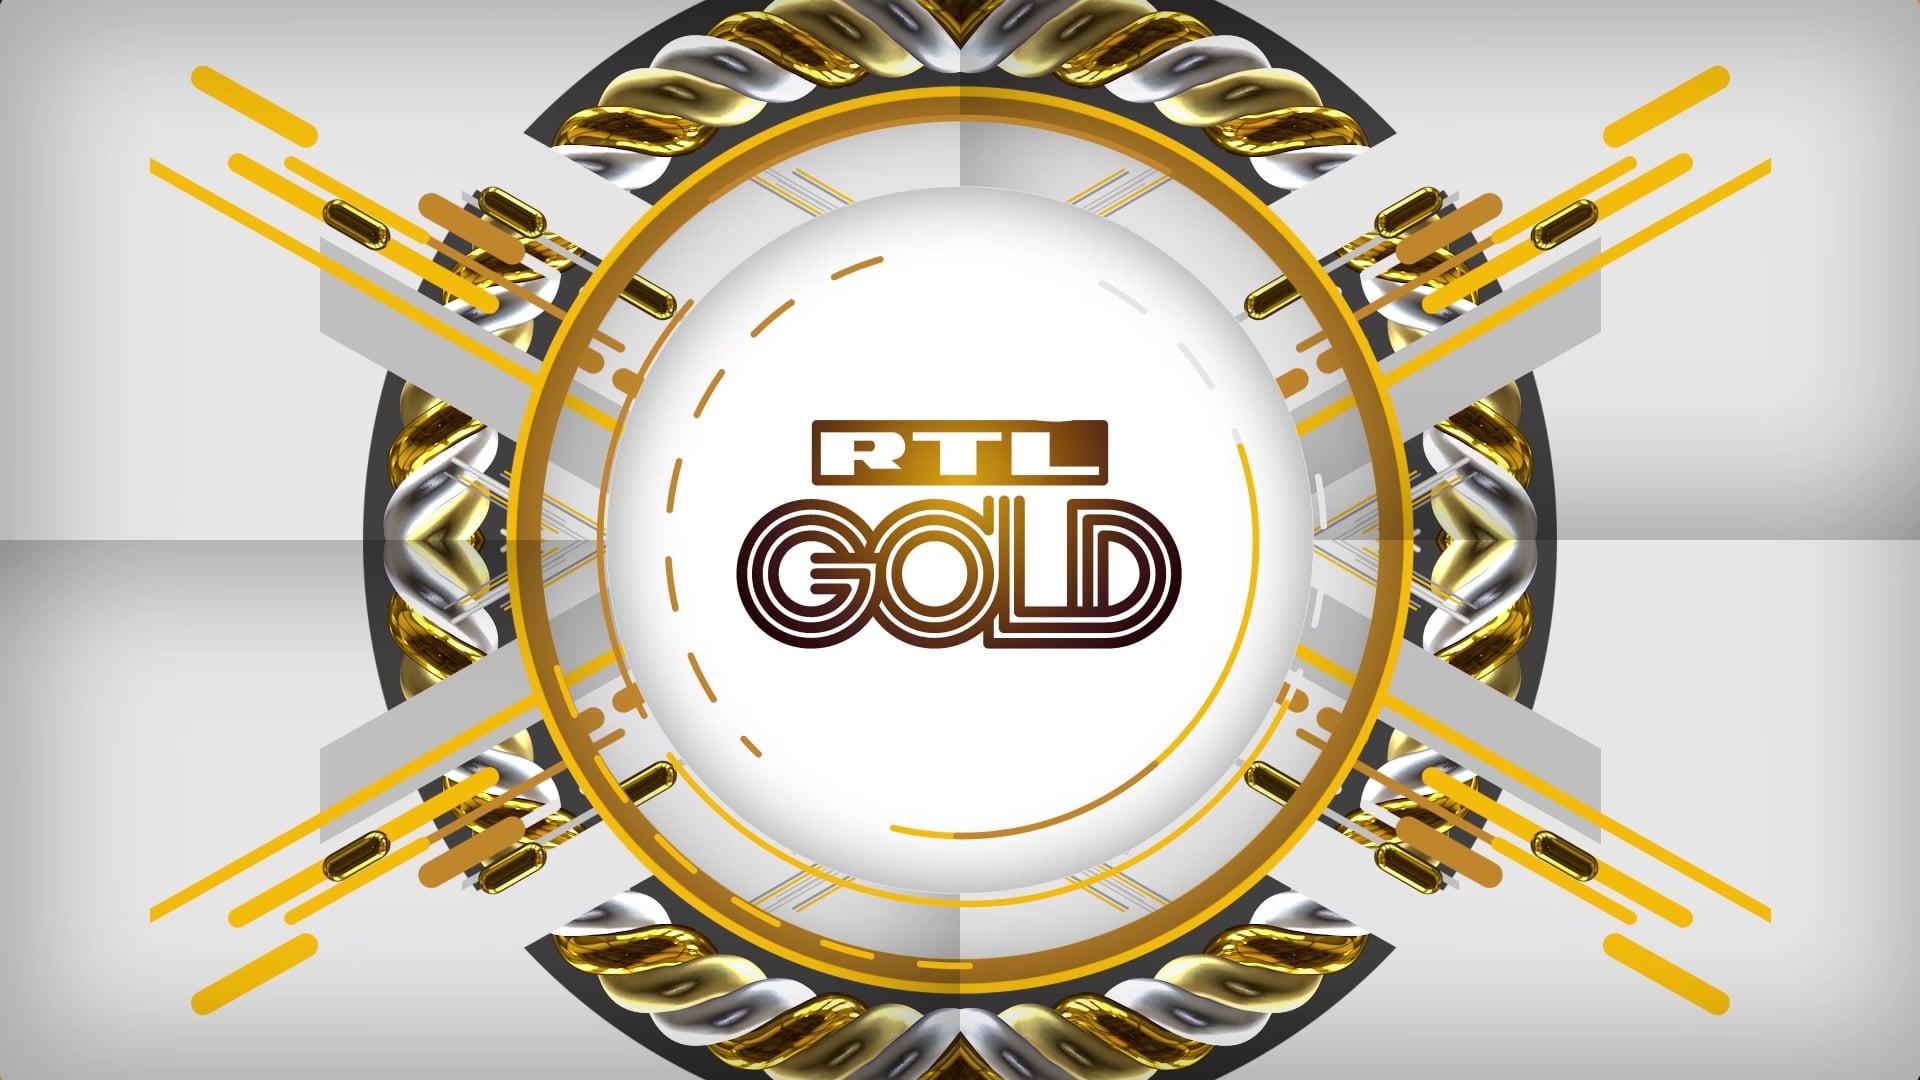 RTL Gold visual identity | branding